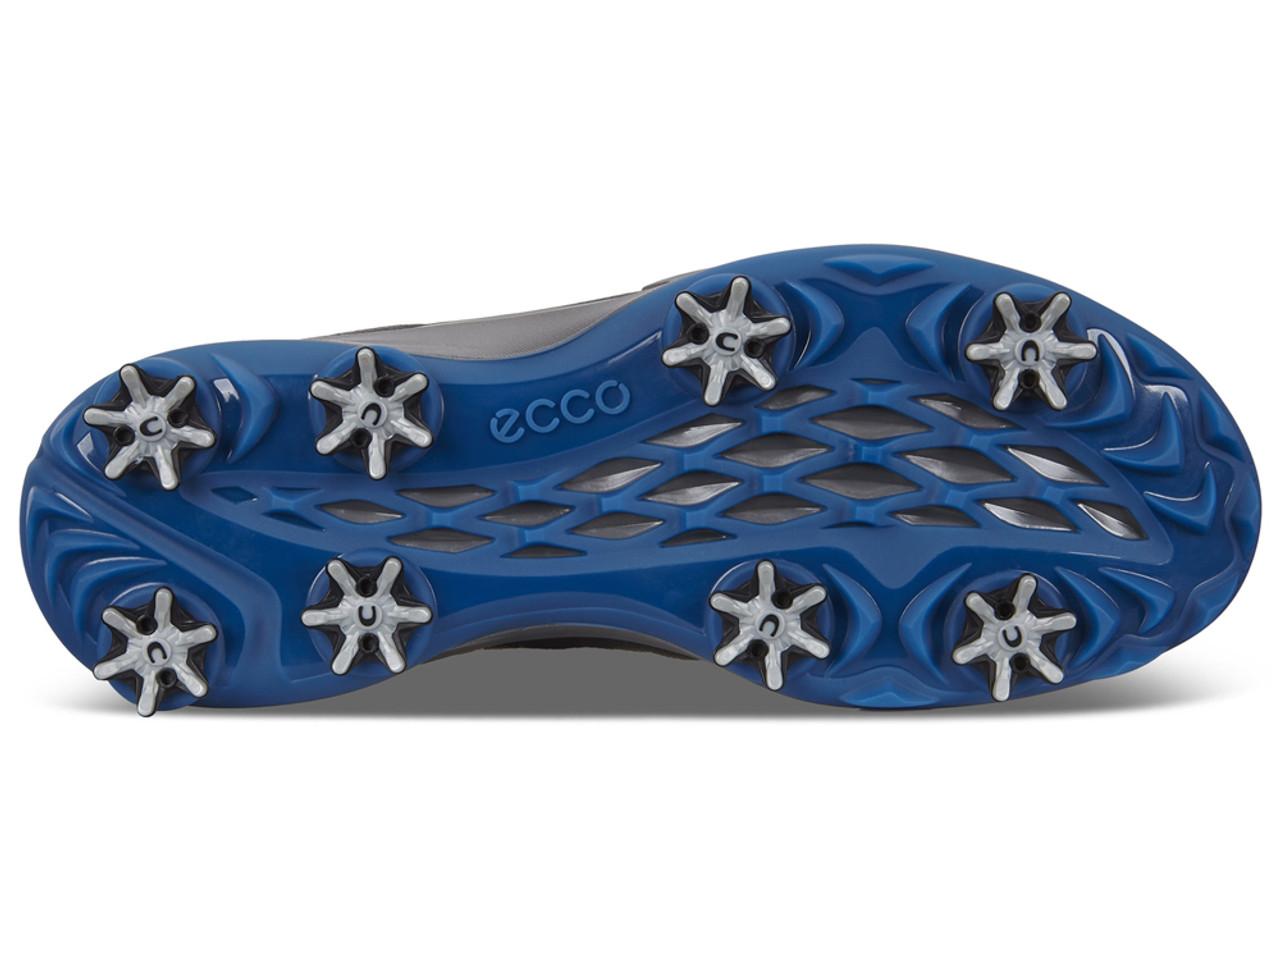 Ecco Biom G3 BOA Golf Shoes - Black